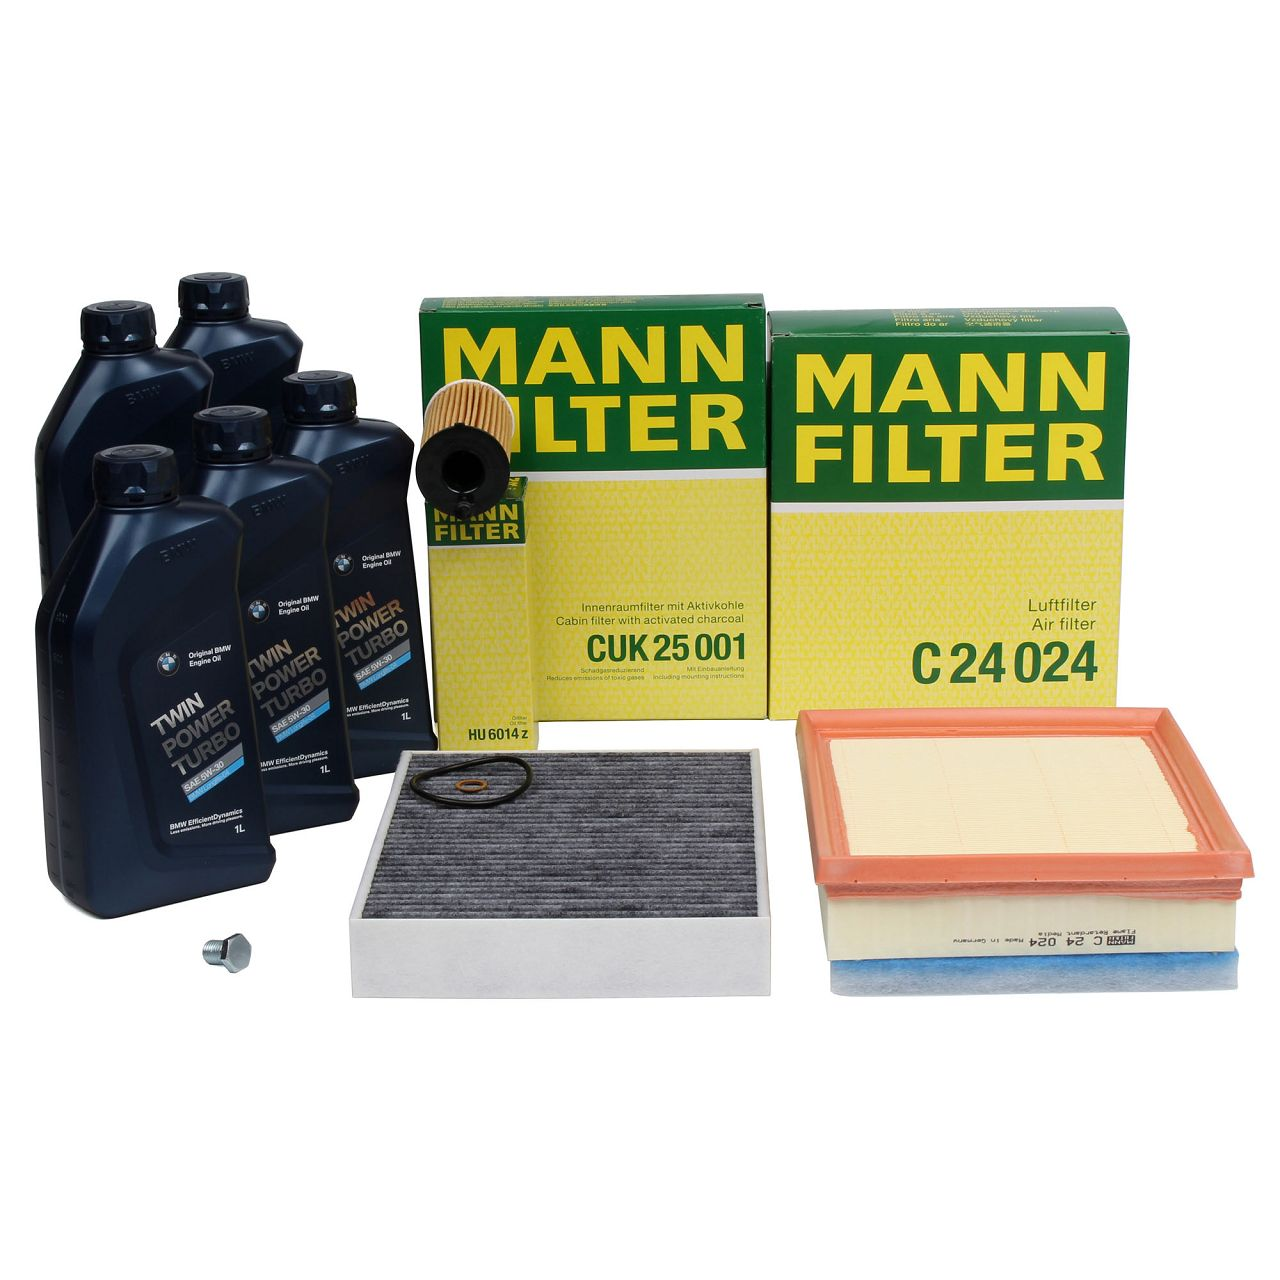 MANN Filterset + 5 L ORIGINAL BMW 5W30 Motoröl für 3er F30 F31 F34 316d 320d